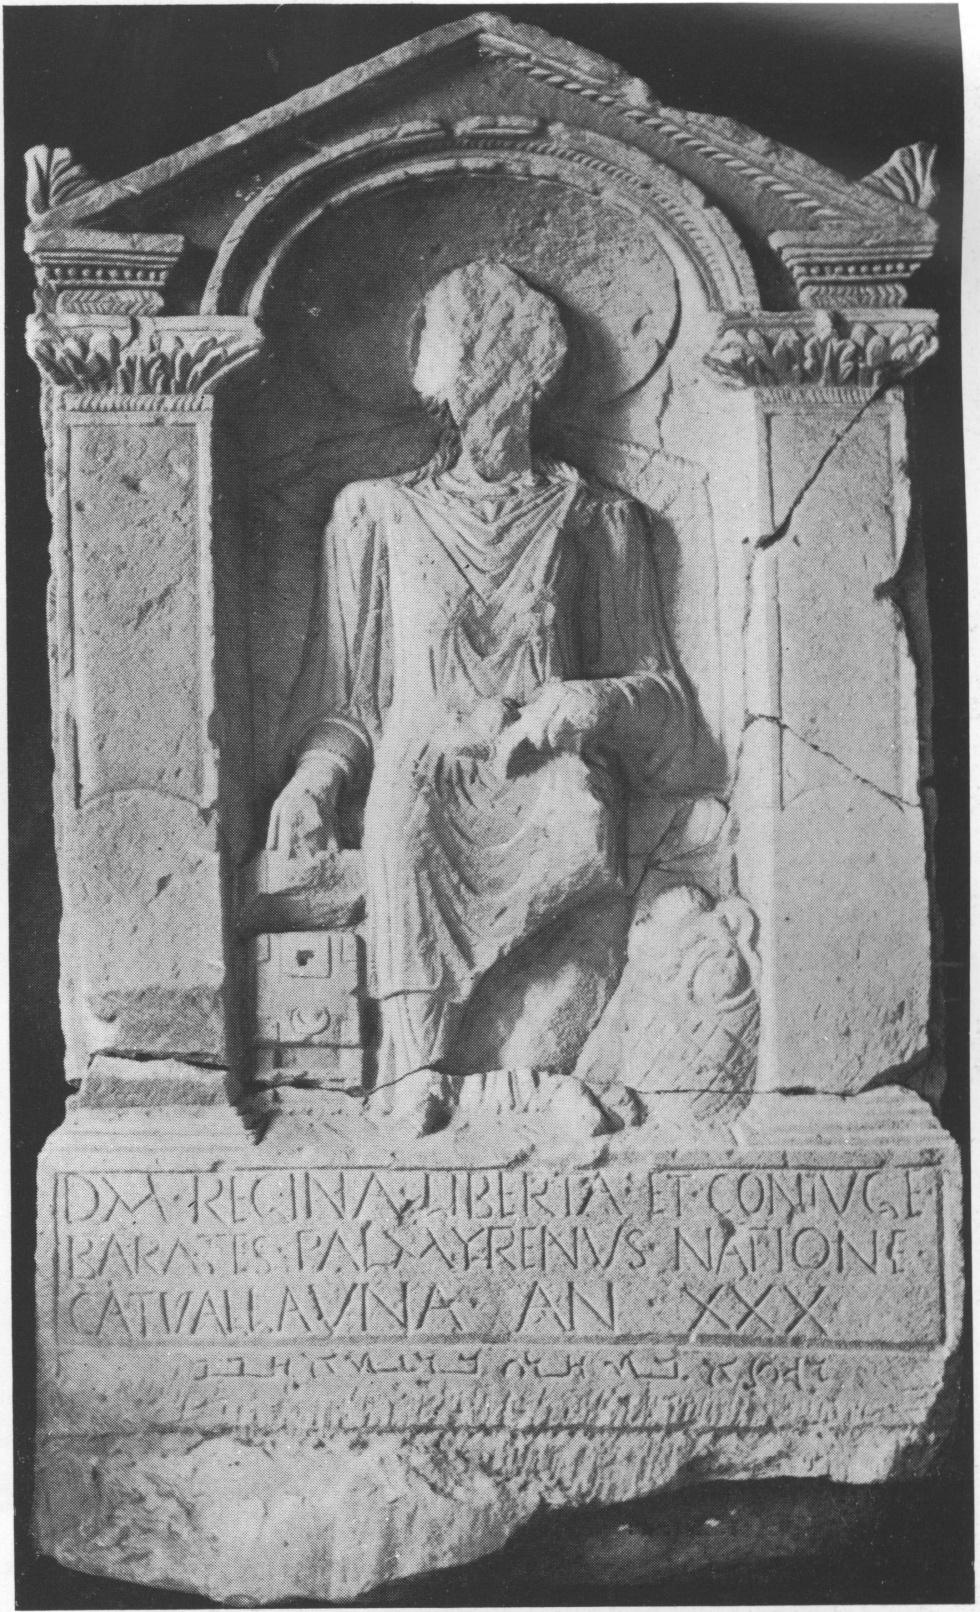 http://romaninscriptionsofbritain.org/inscriptions/1065